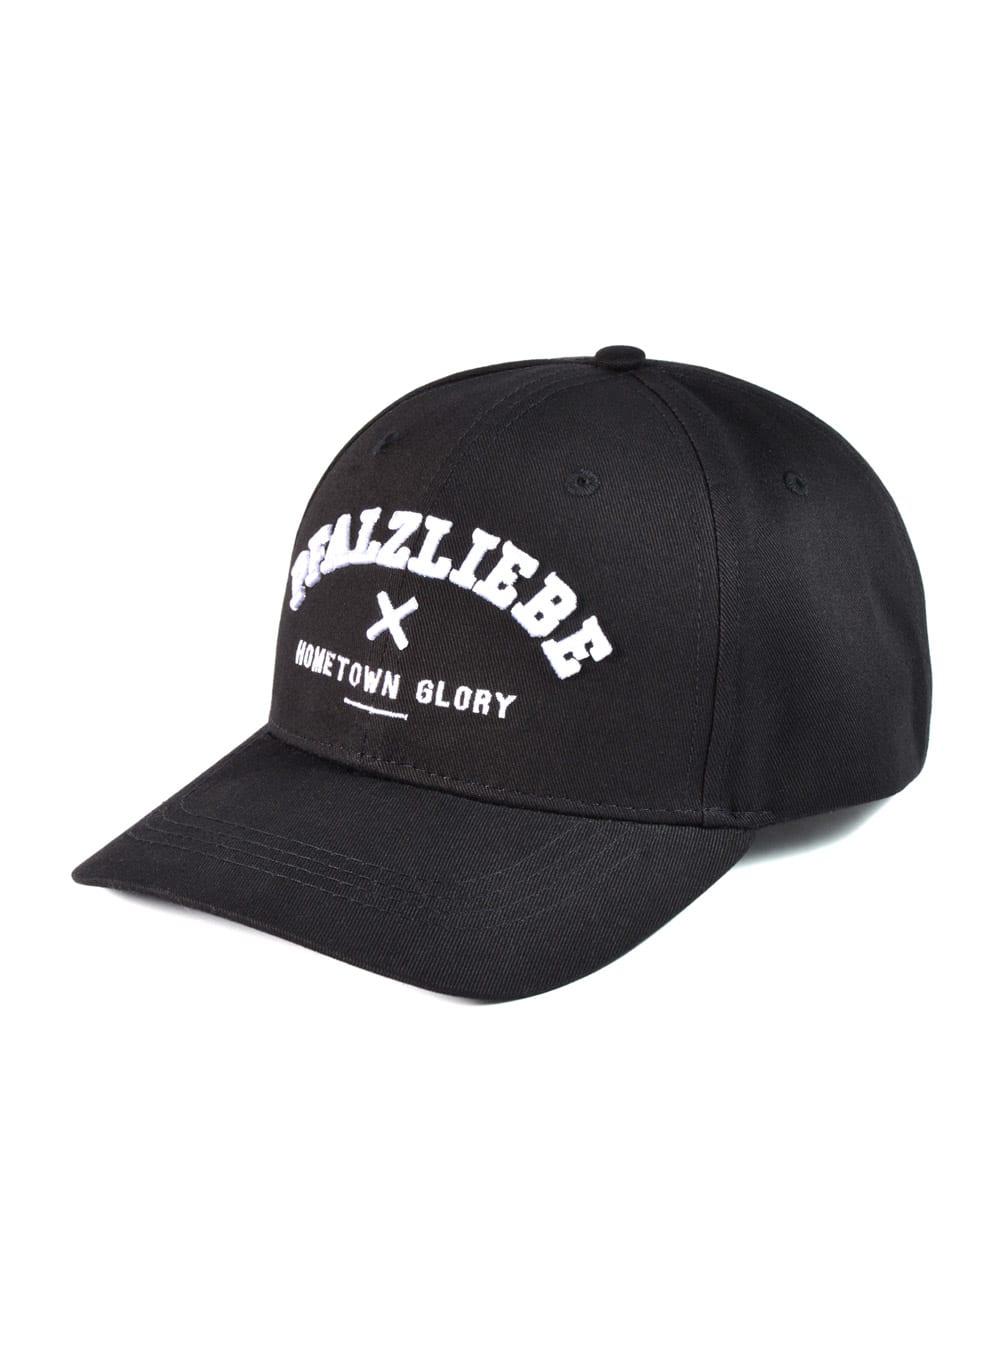 7836184f250b13 PFALZLIEBE 2.0 BASECAP BLACK   Palatina Outfitters